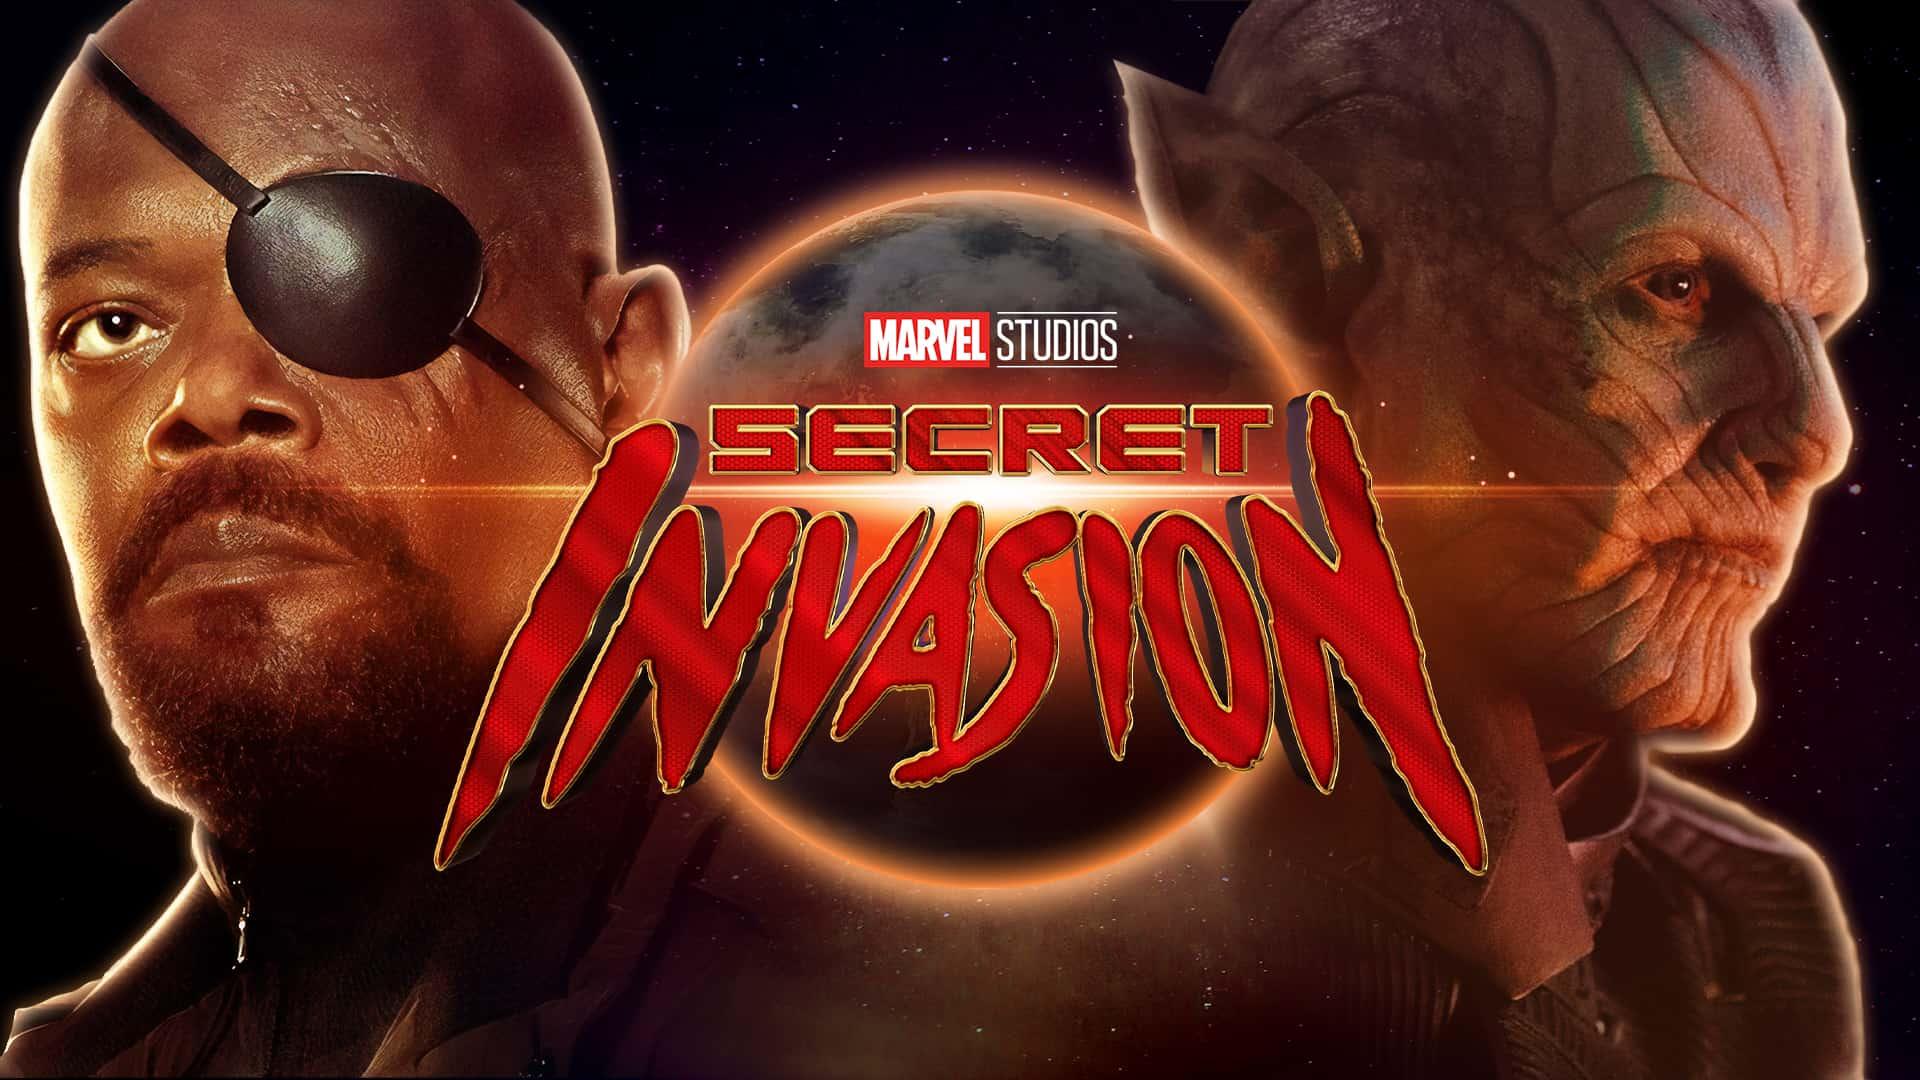 1634636084 97 Secret Invasion According to Samuel L Jackson the filming of